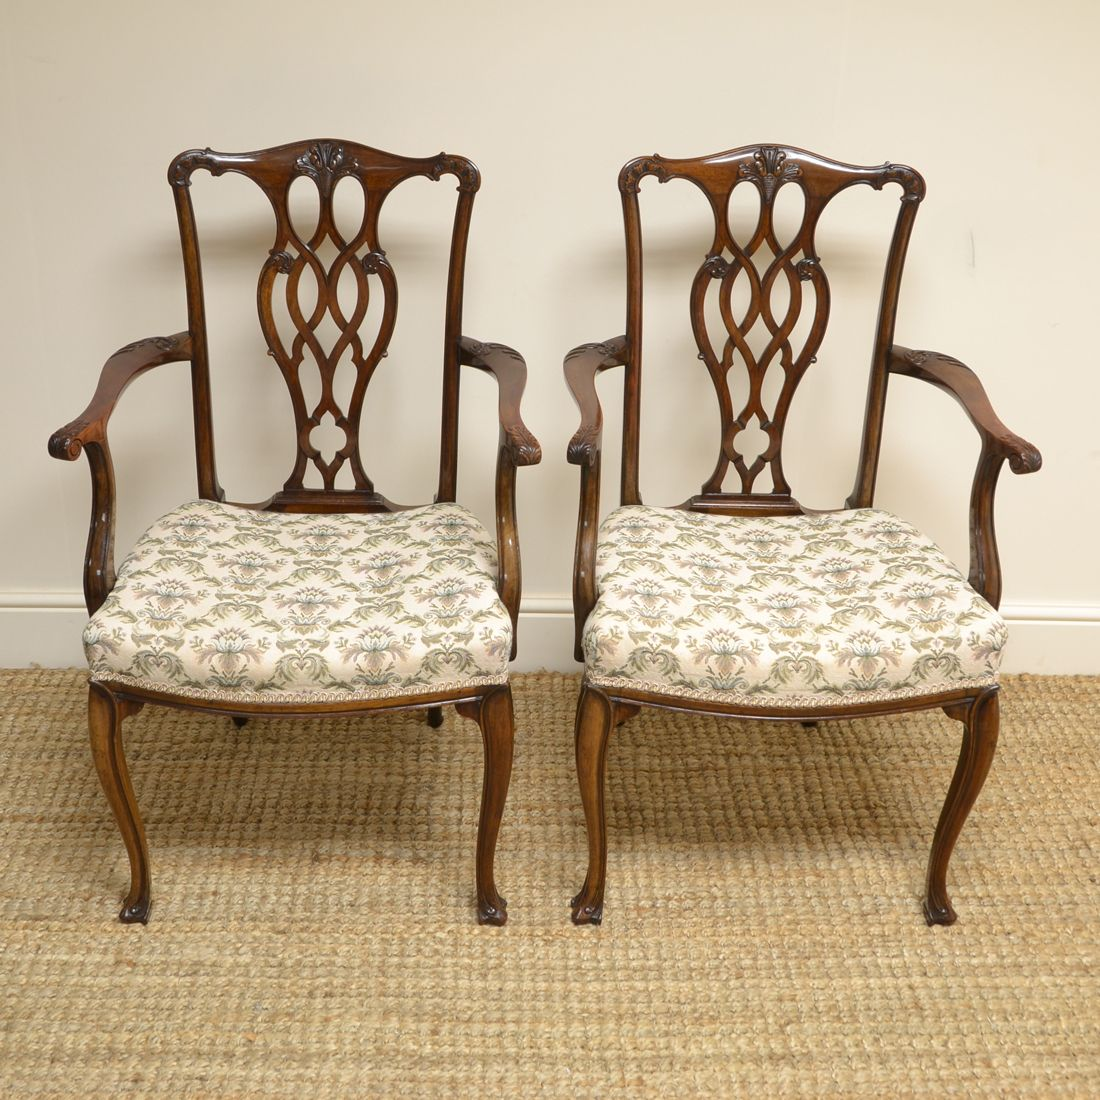 Sensational Pair of Walnut Edwardian Chippendale Design